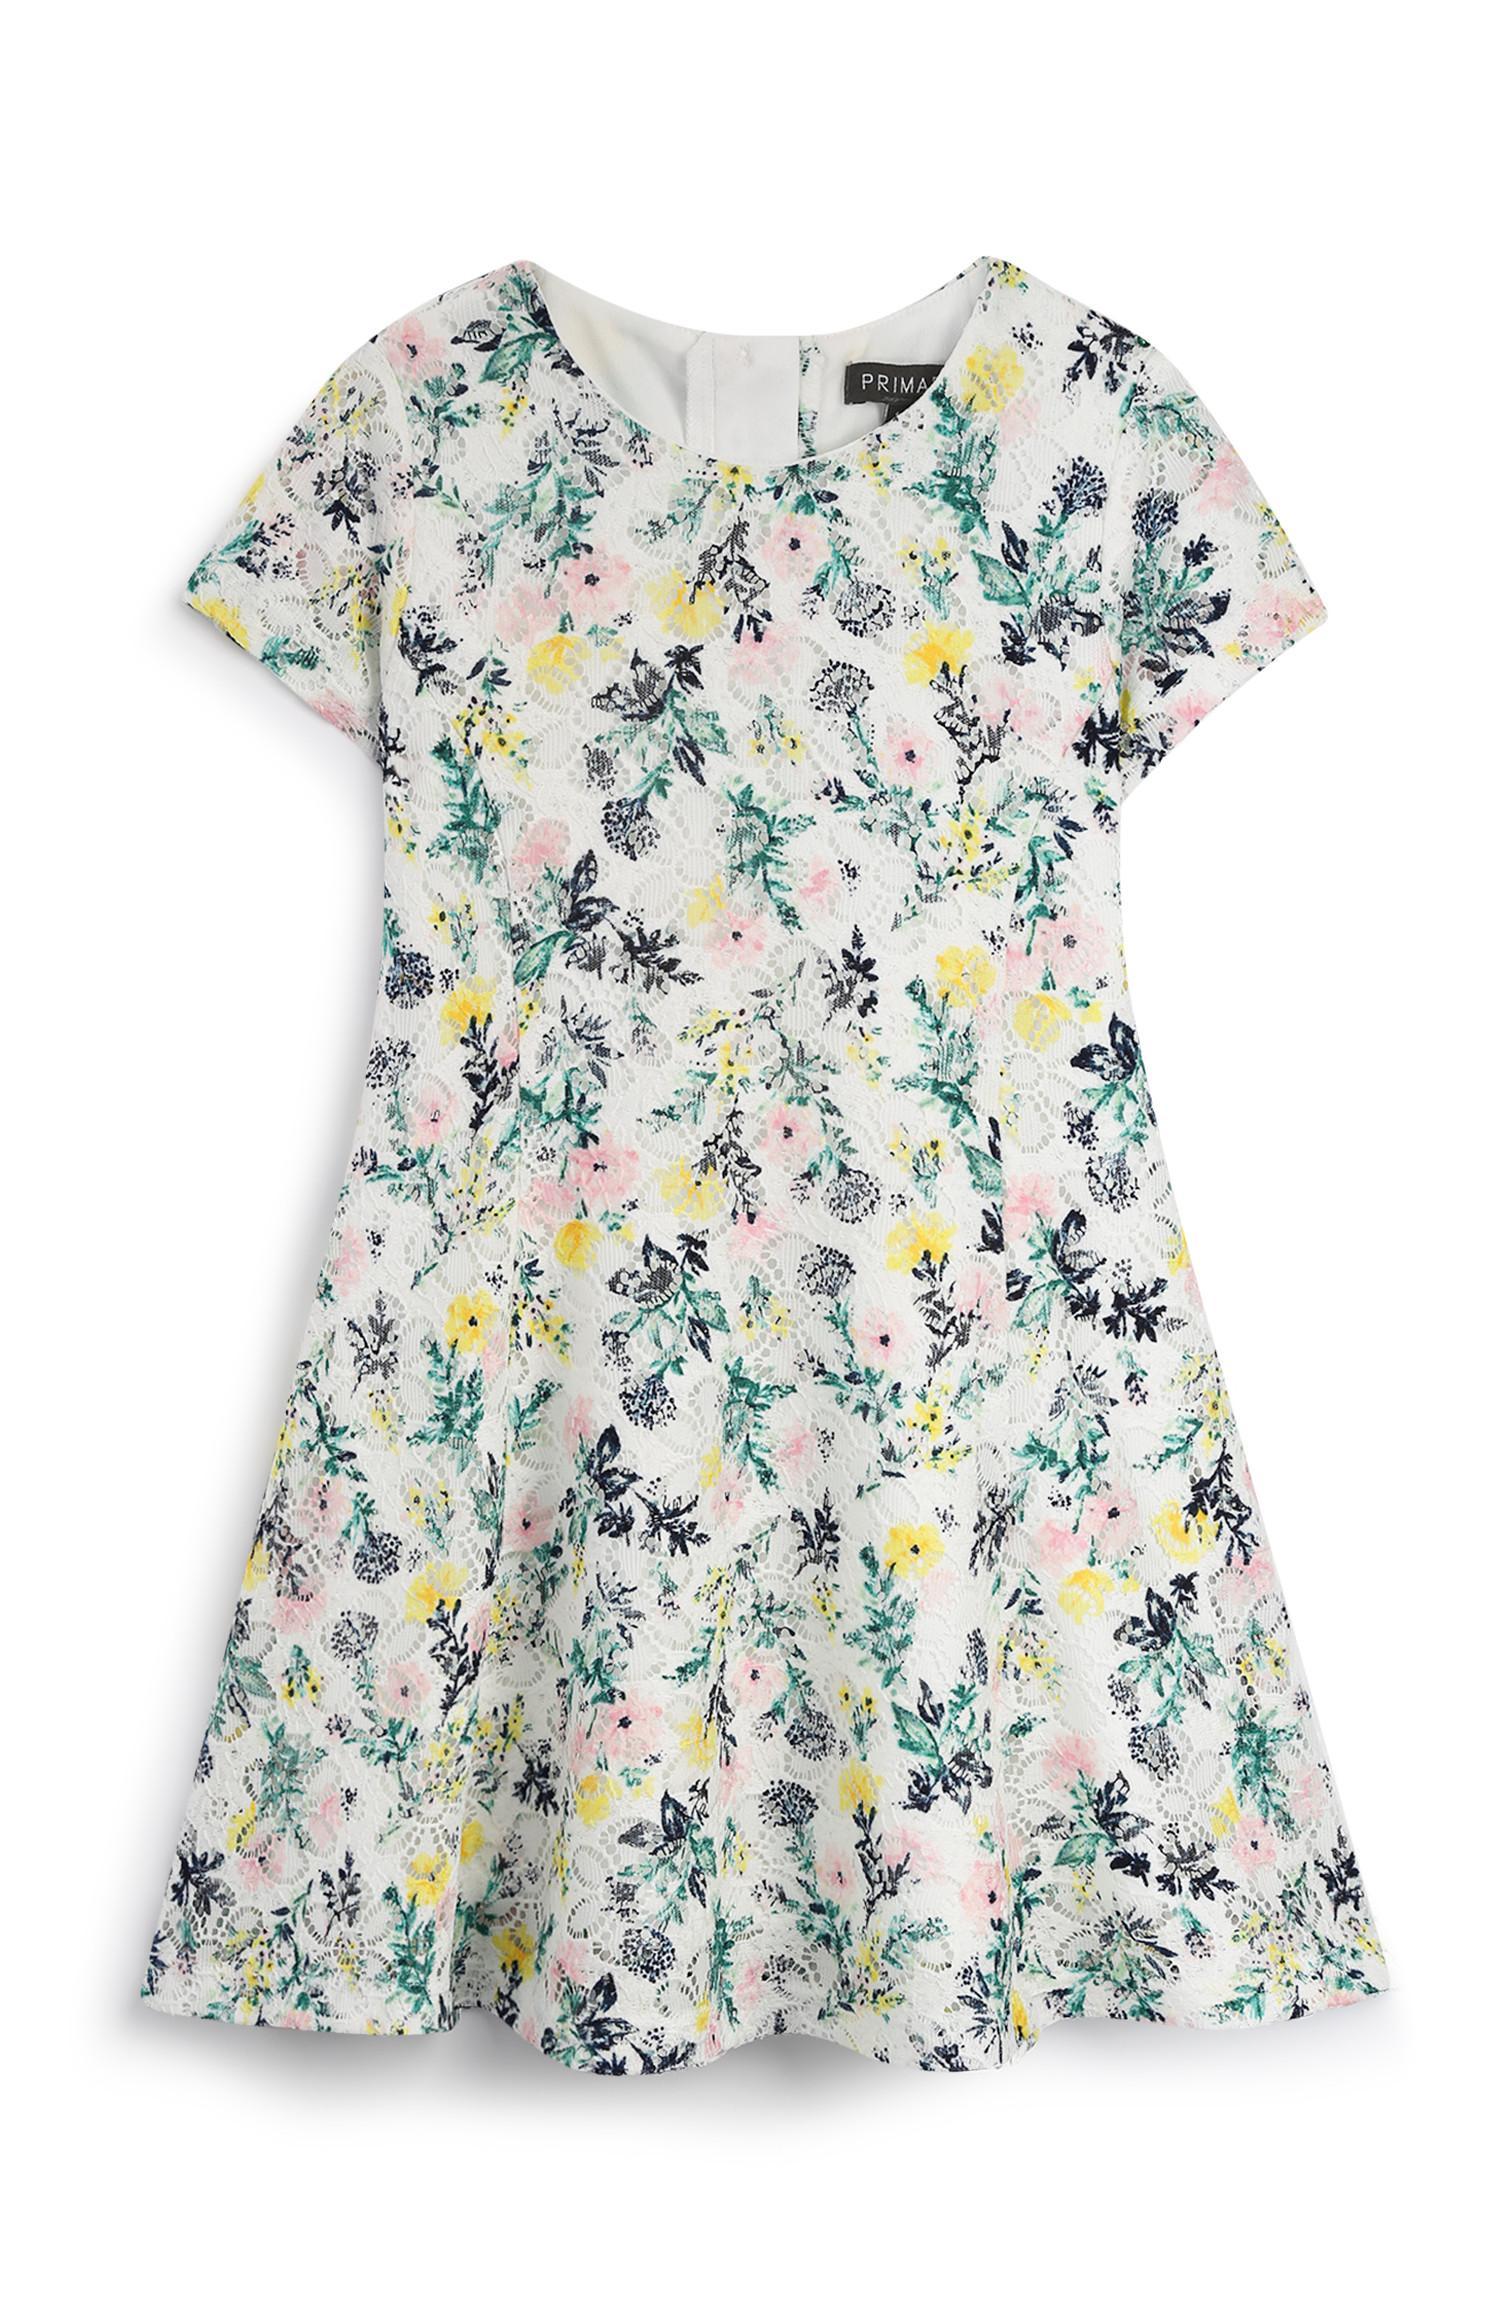 Vestido padrão floral bebé